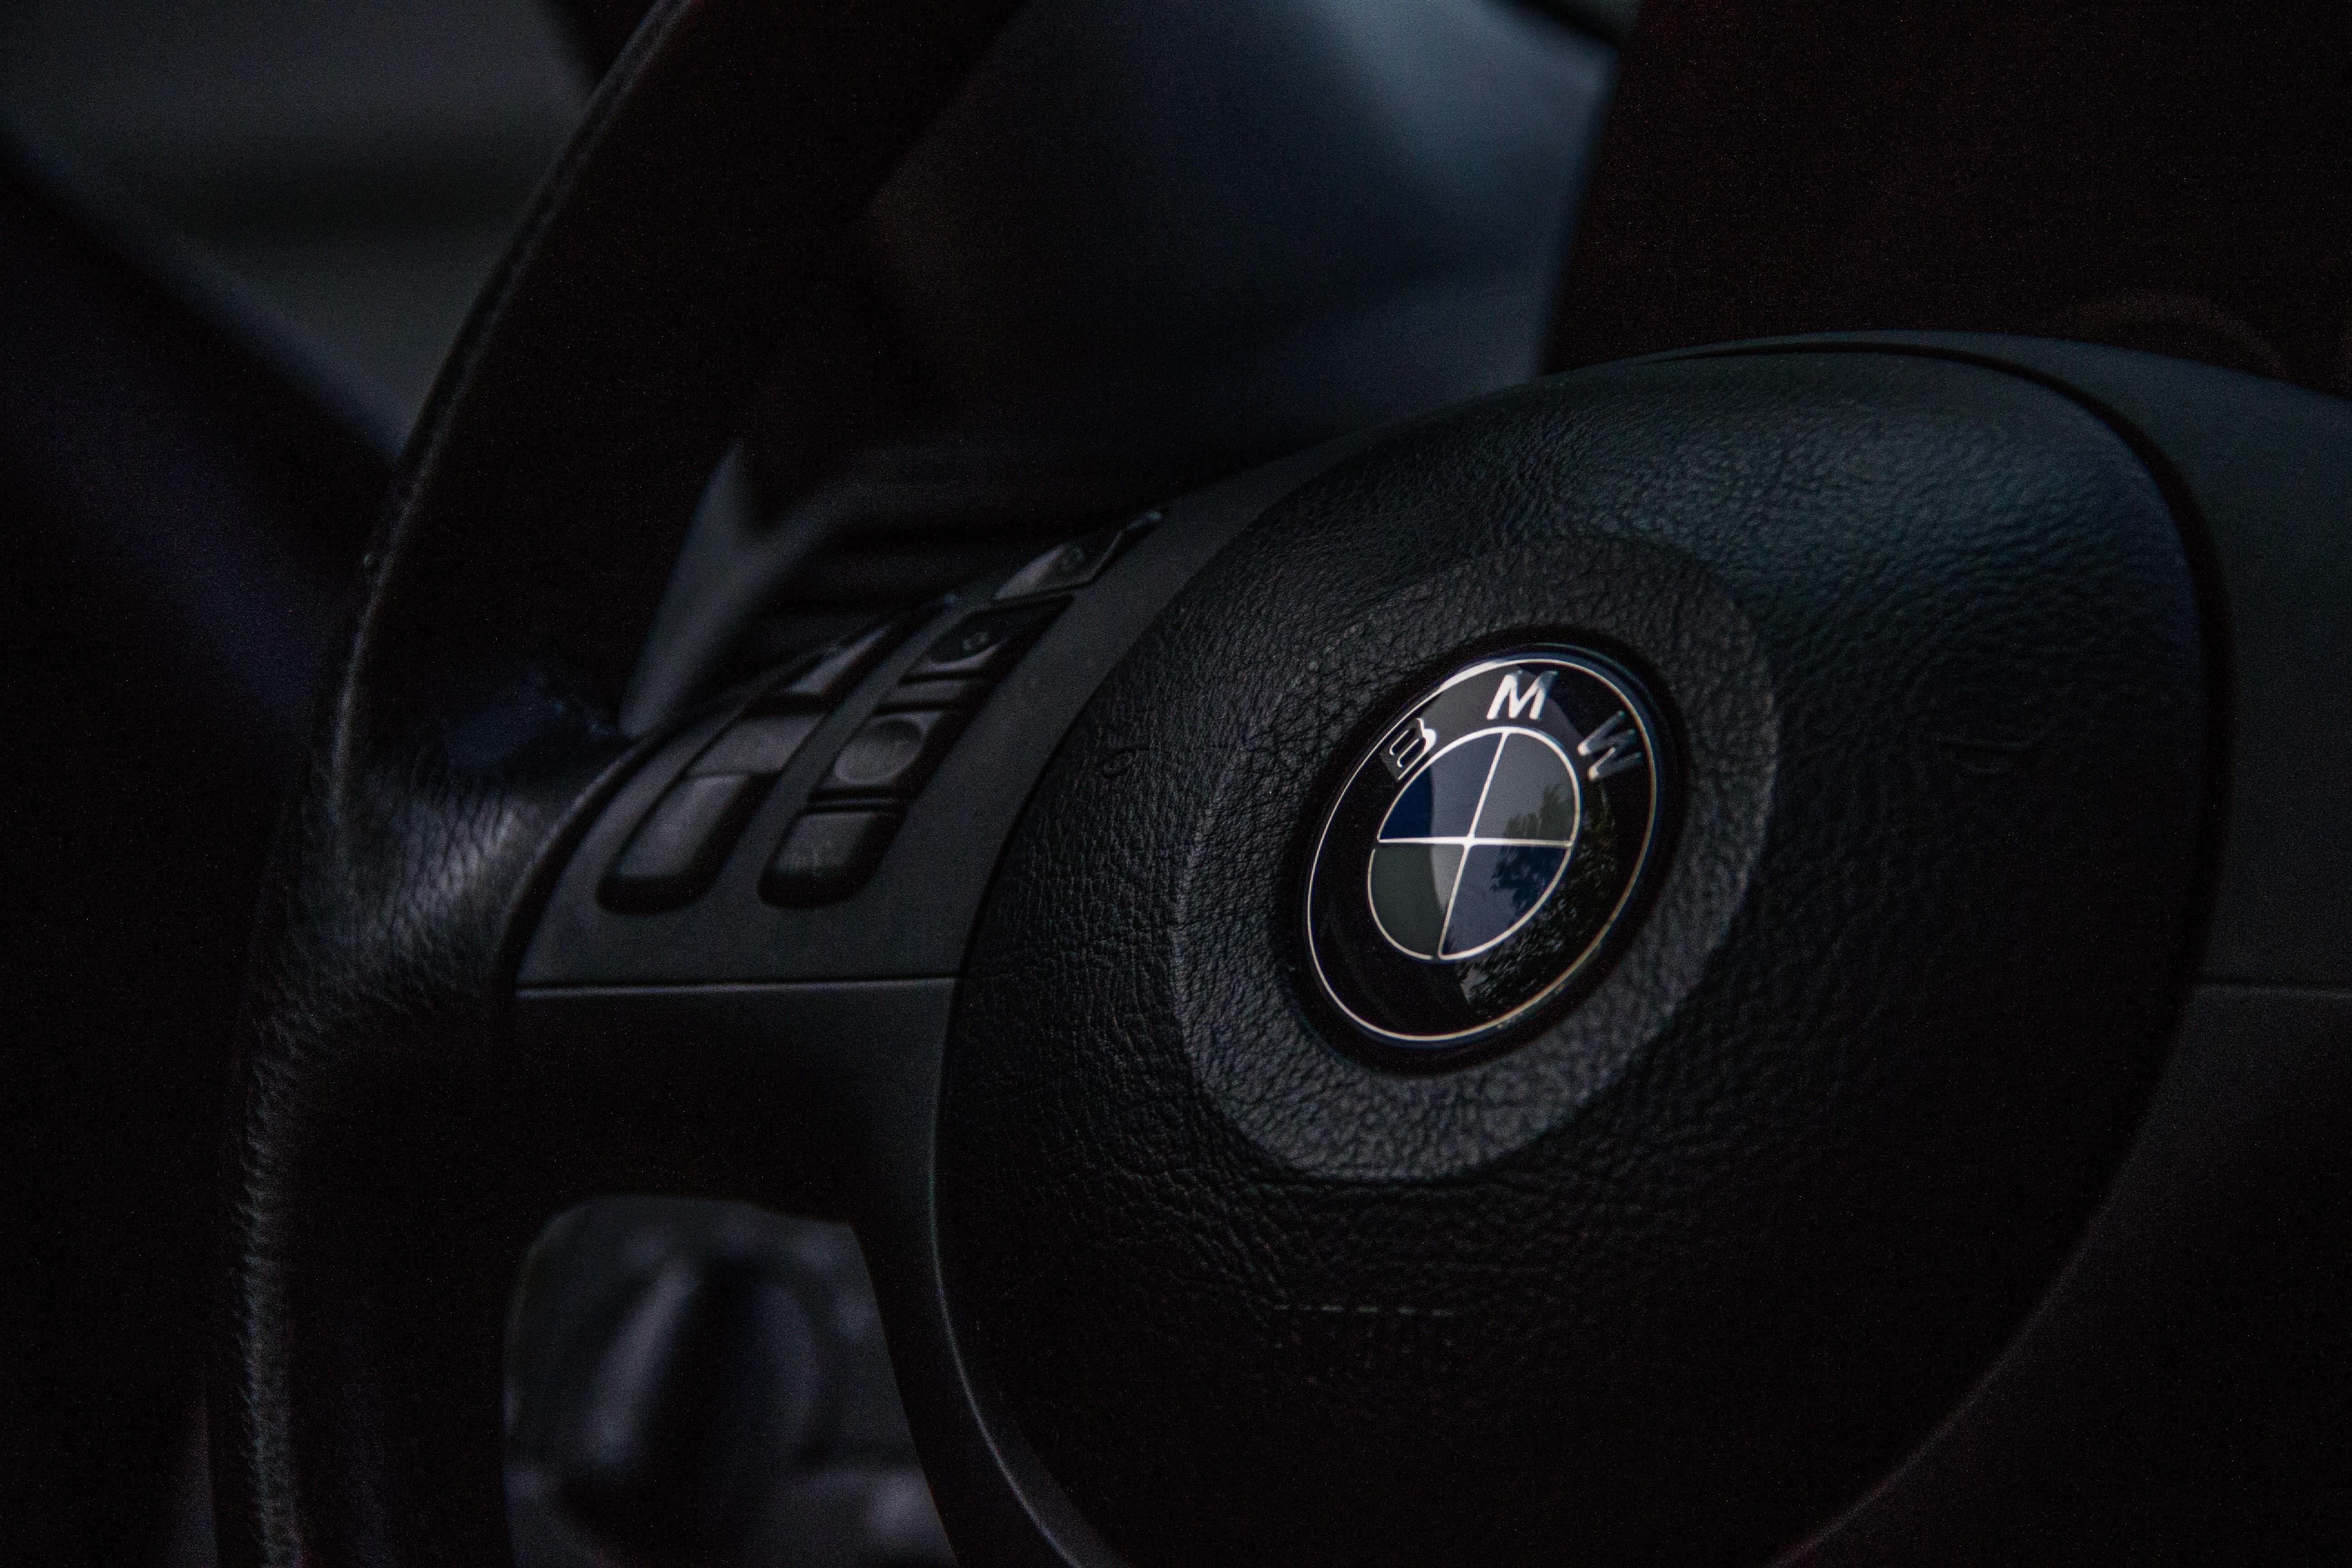 Wallpaper Black Car Interior Sports Car Bmw E46